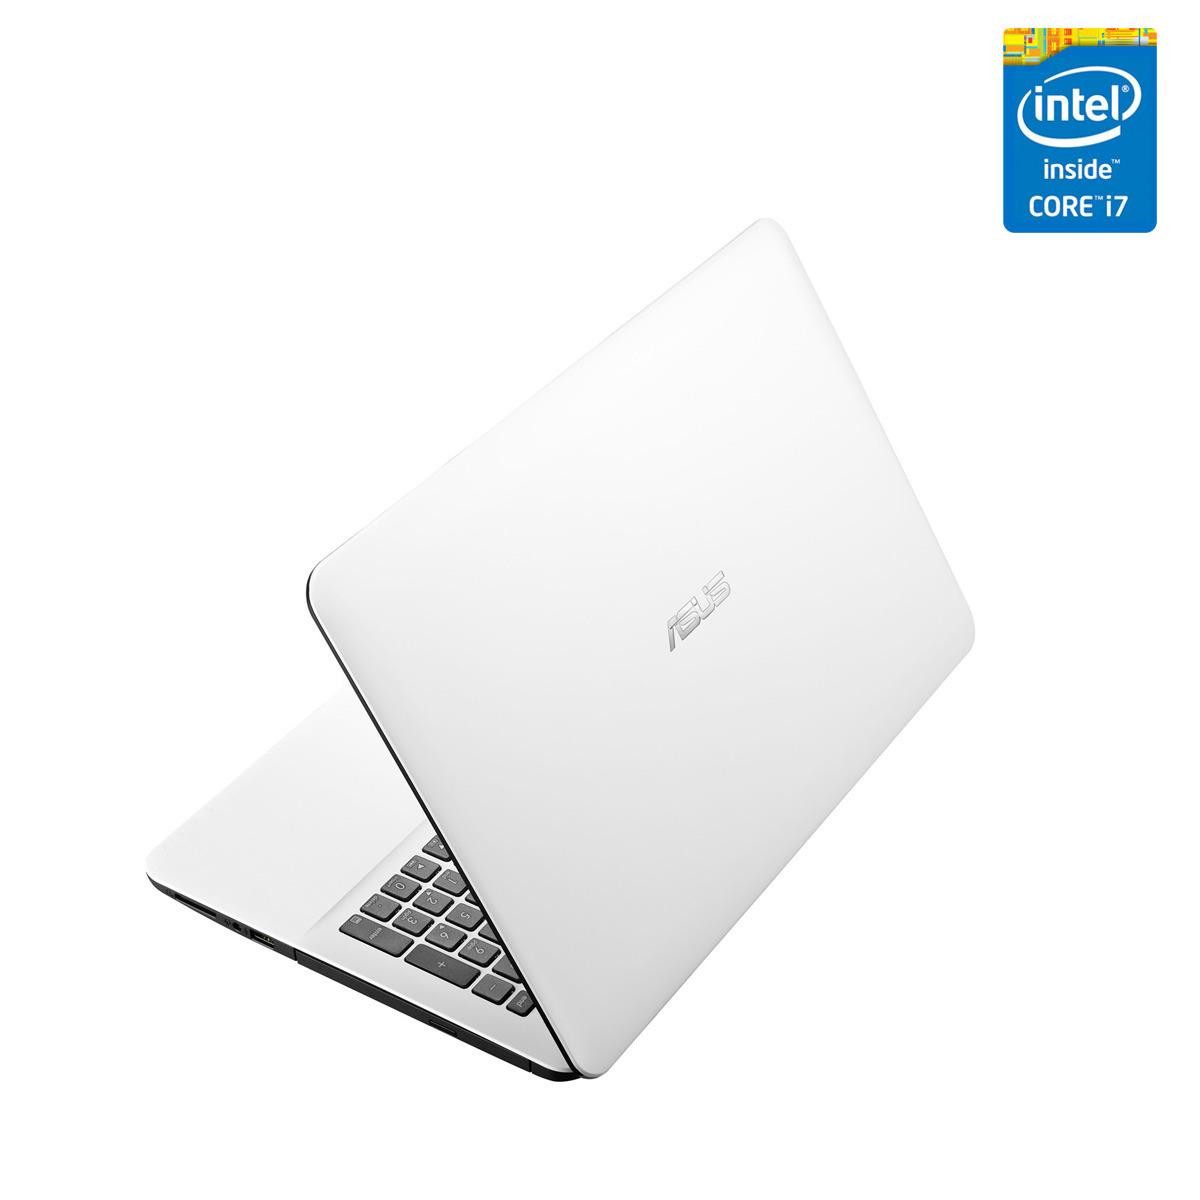 Portátil Asus 15,6'' F555LJ-XX495H Intel Core i7 5500U